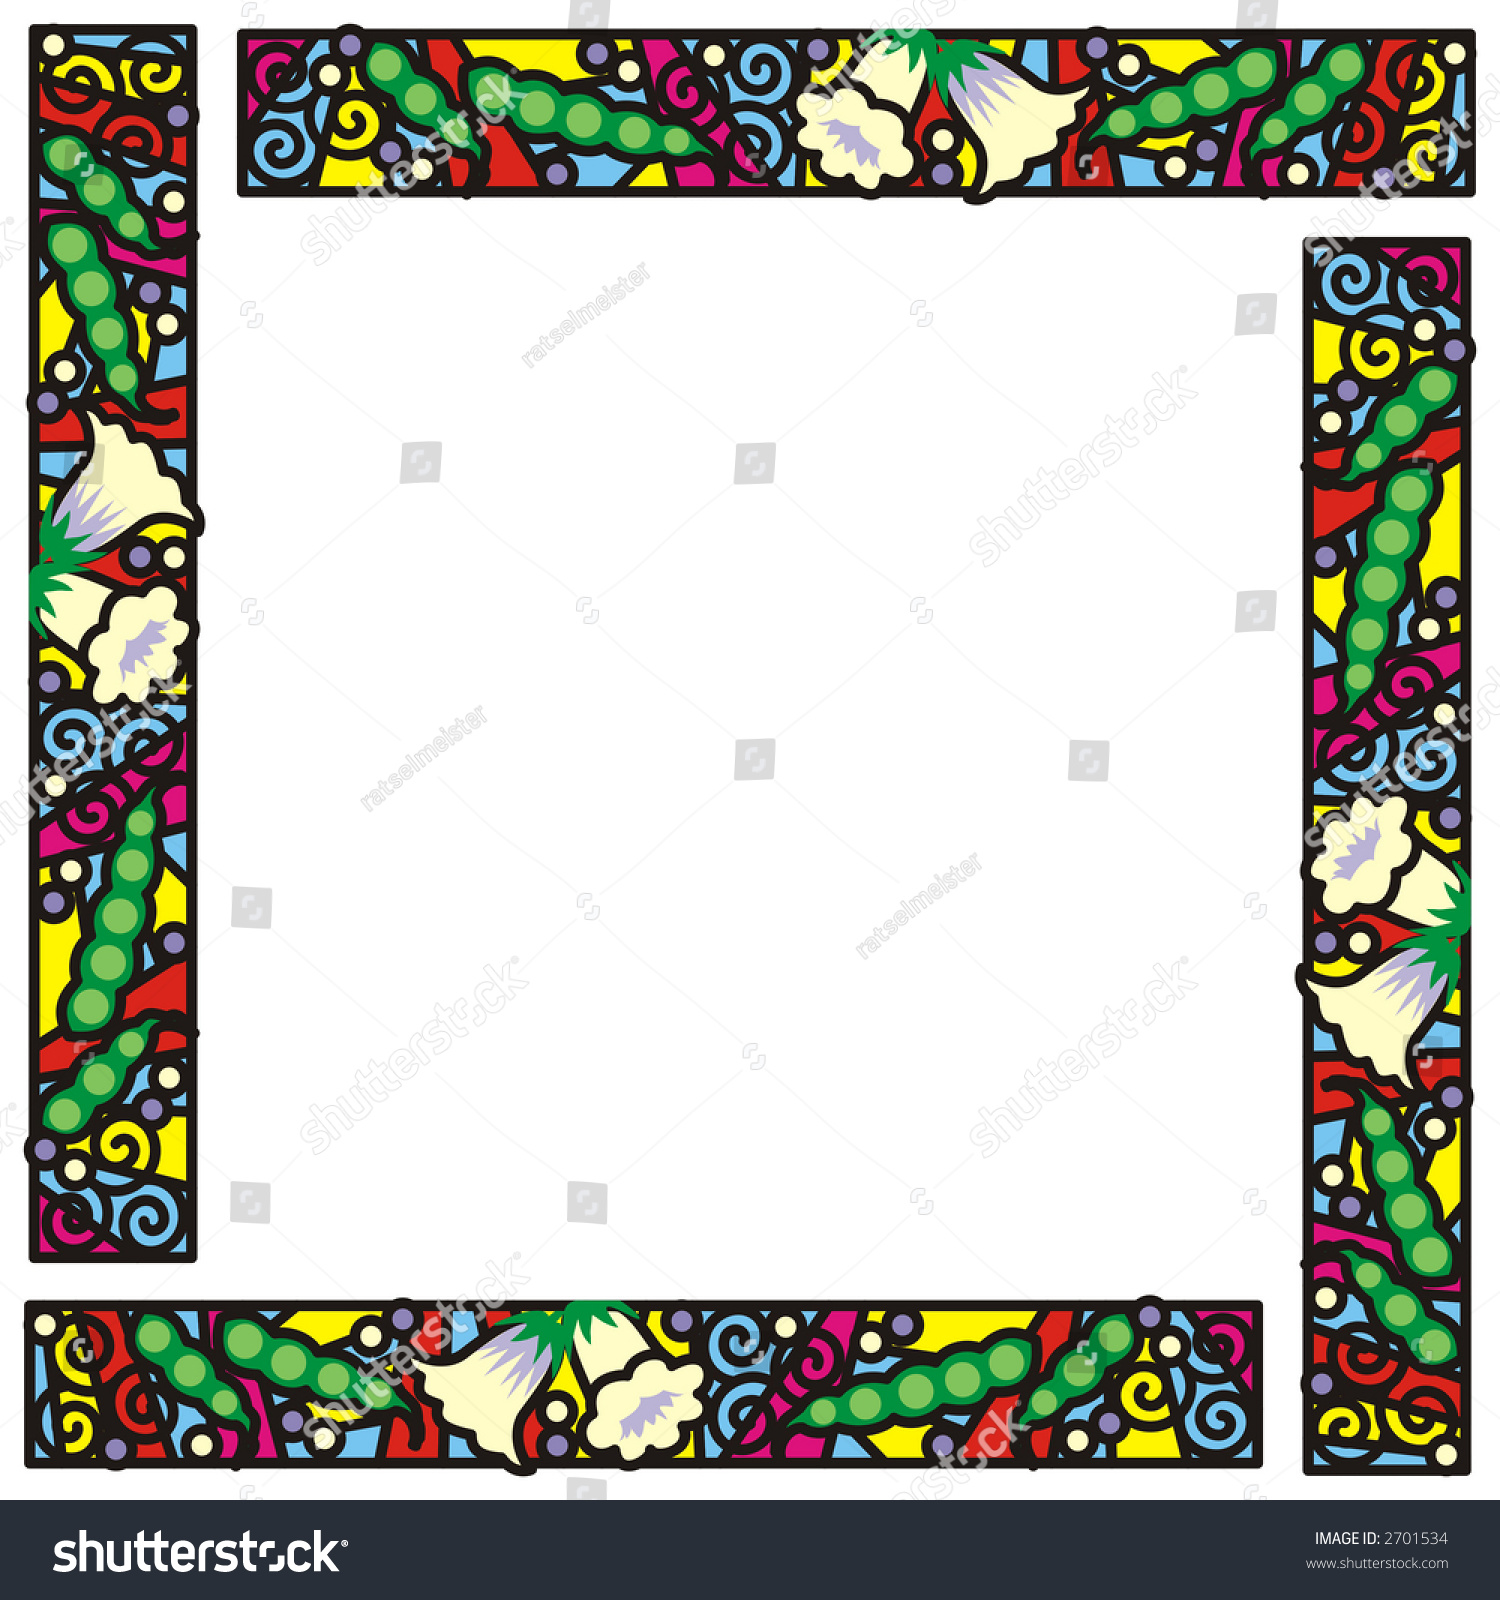 stained glass frame four panel border stock illustration 2701534